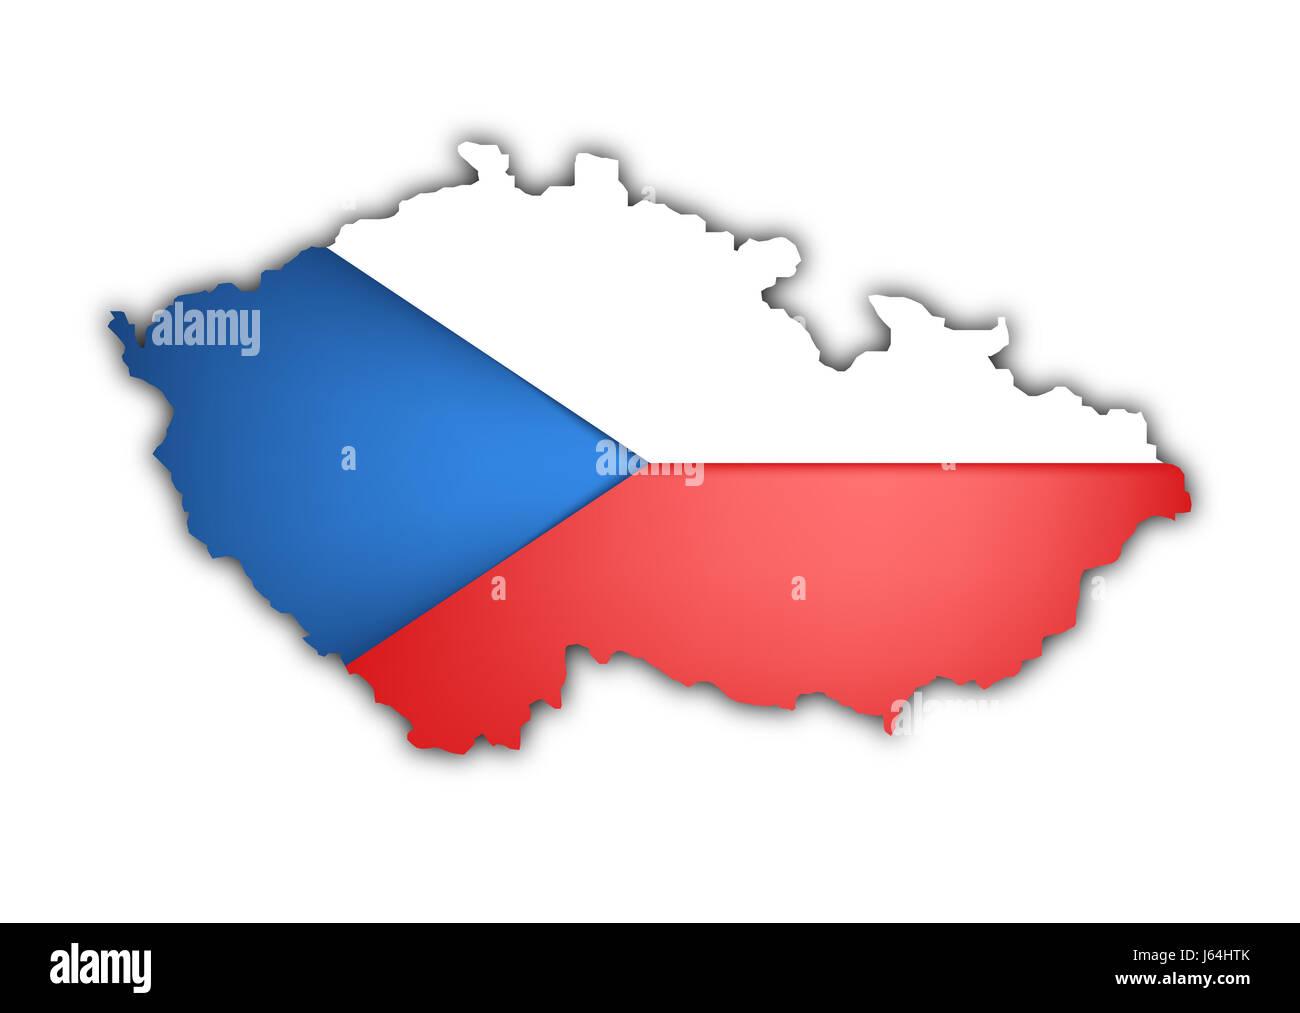 Prag Karte Europa.Europa Prag Flagge Union Republik Tschechische Karte Atlas Landkarte